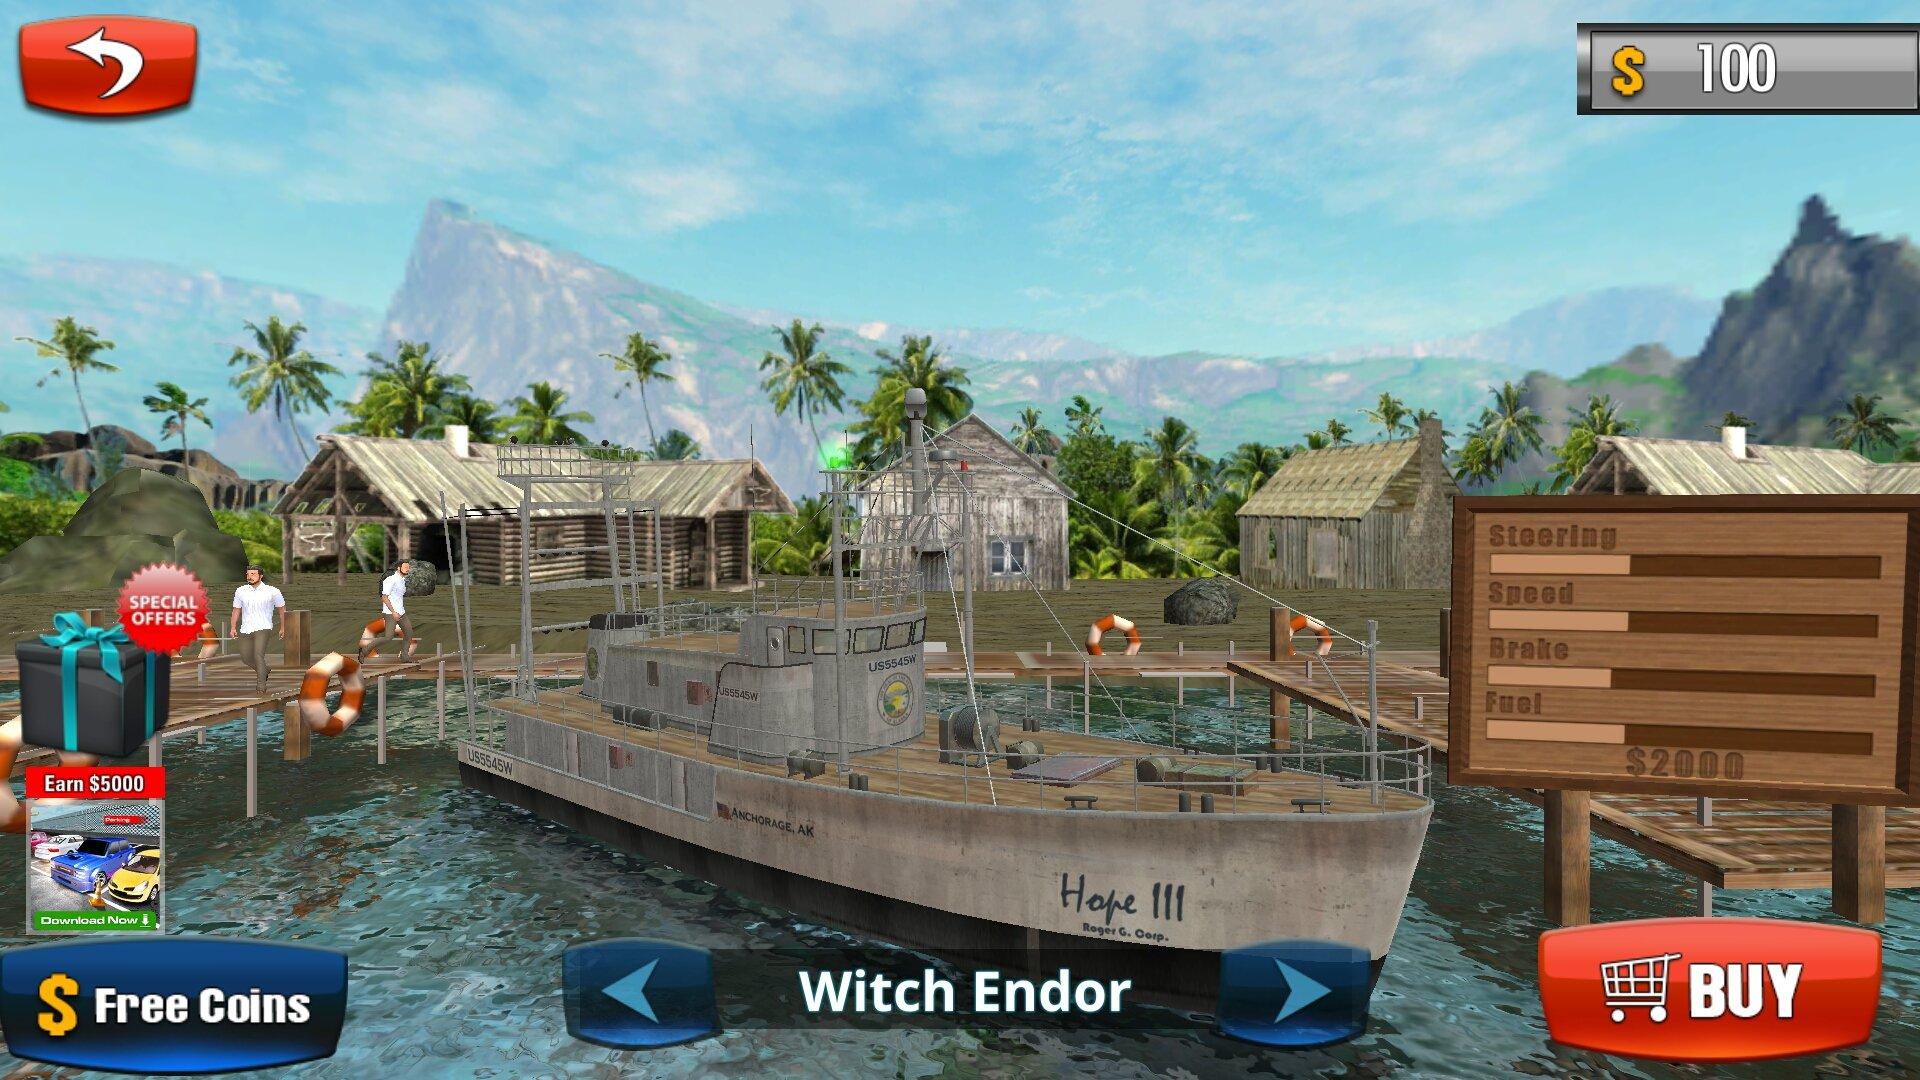 Fishing boat driving simulator ship games android games for Fishing boat games